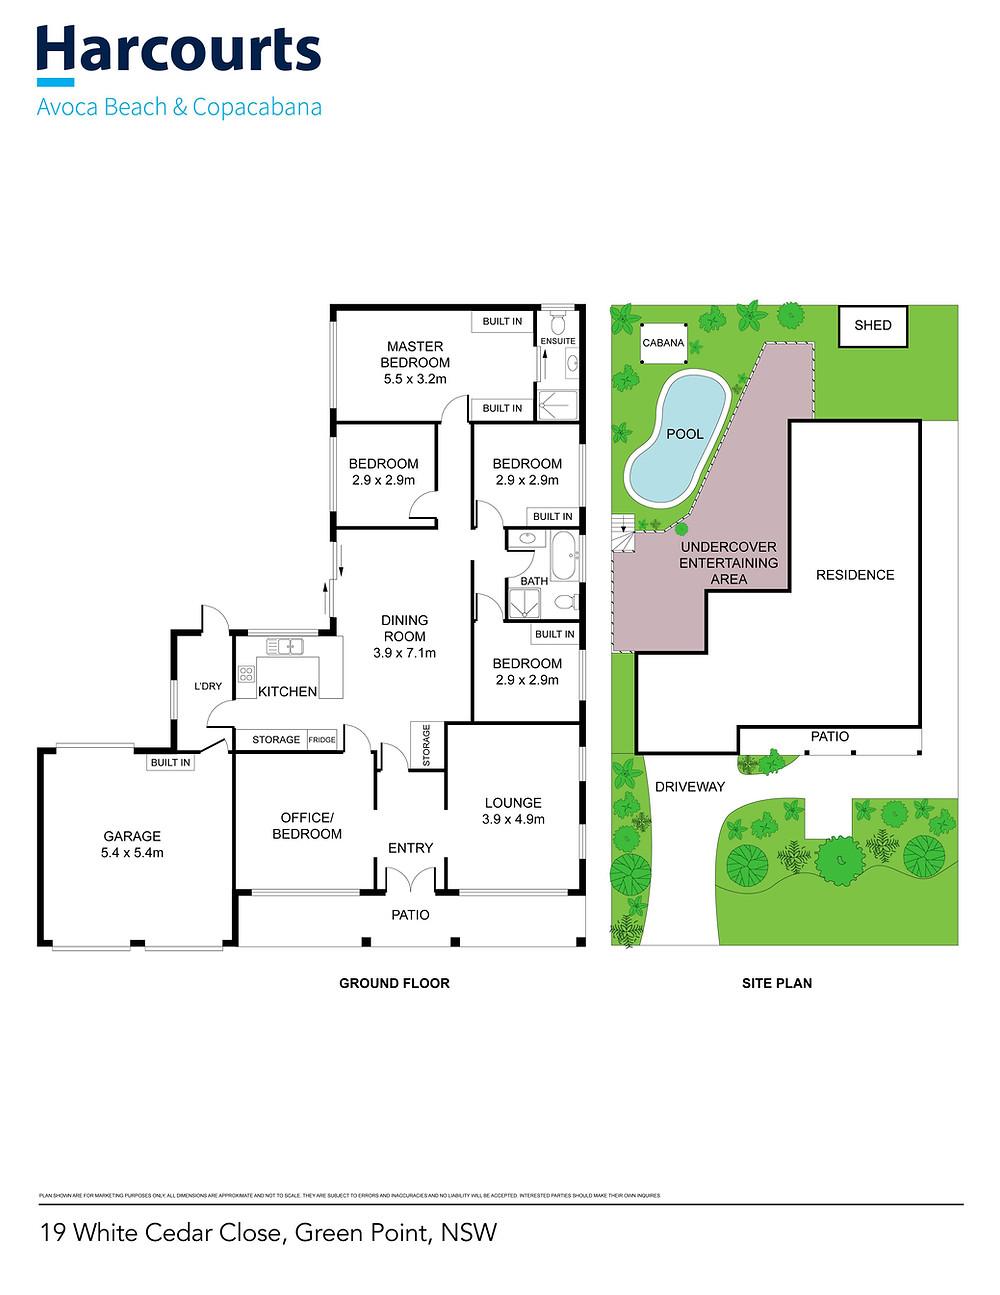 Professional real estate floor plan Design Services central coast